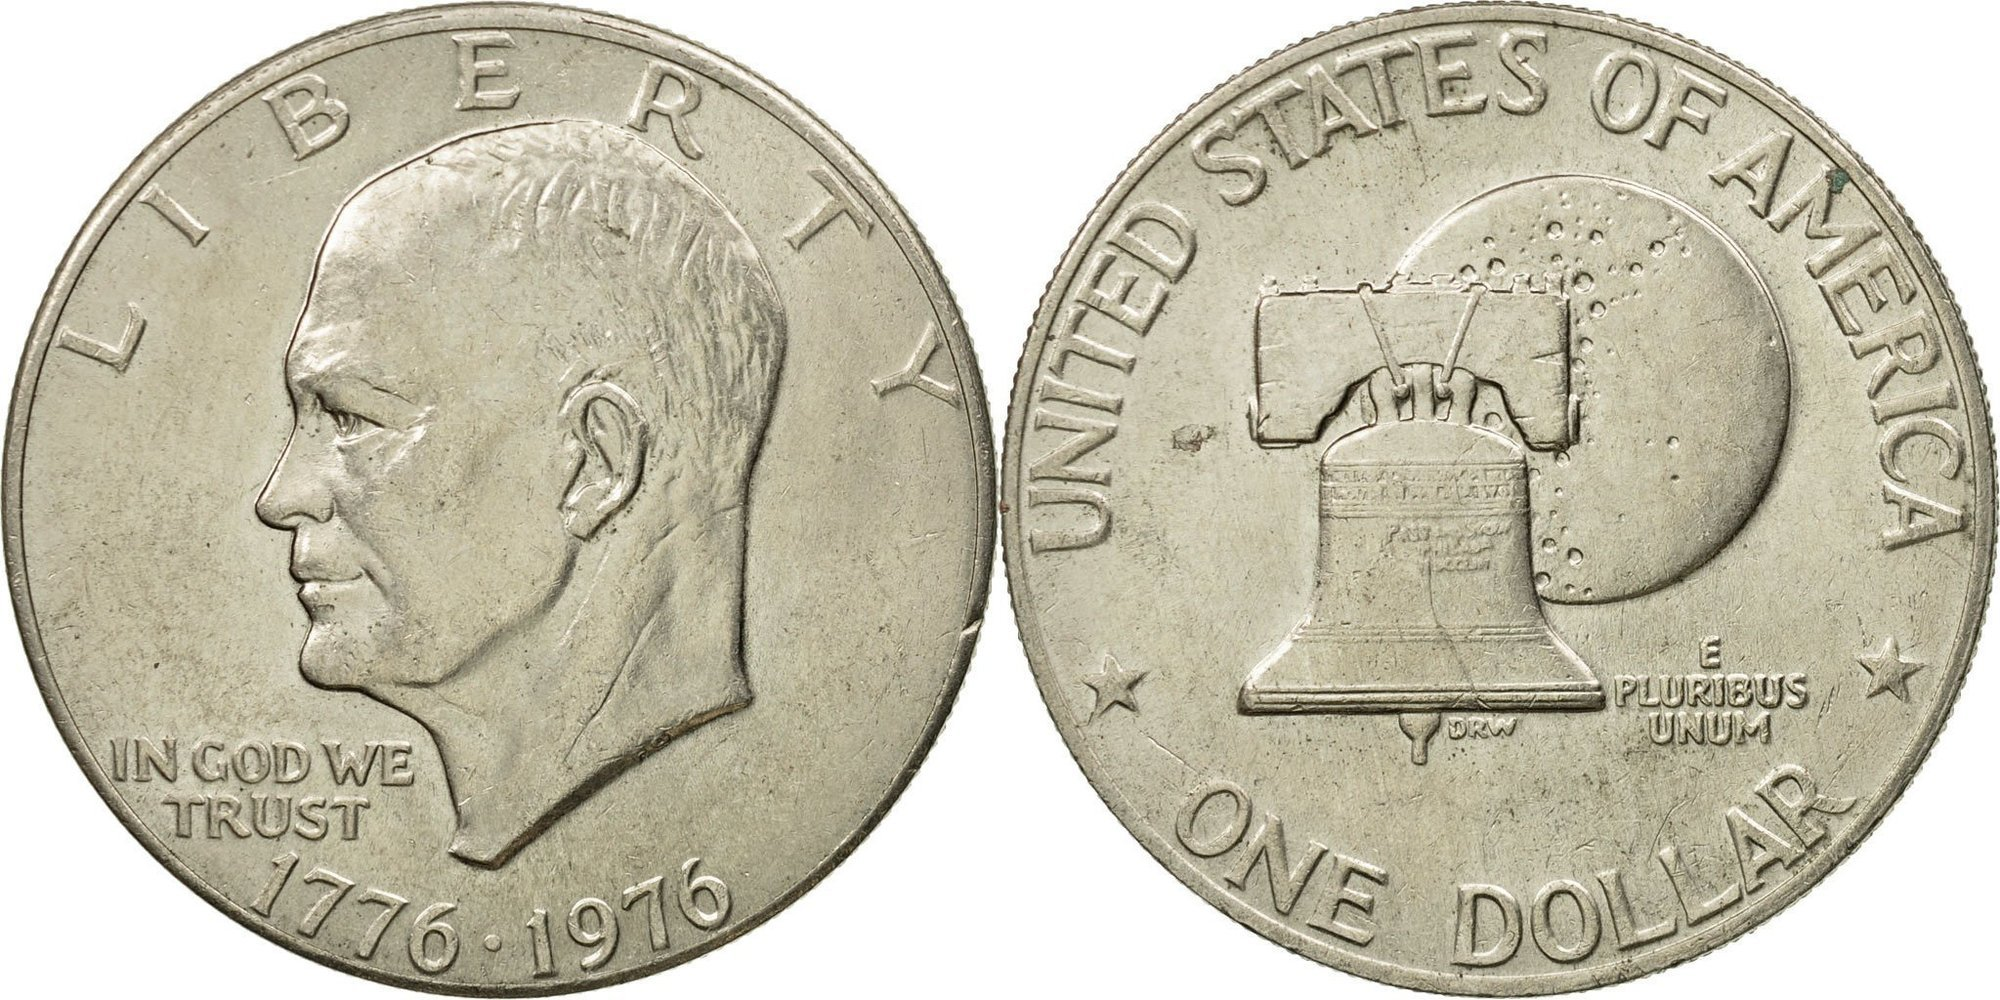 1 доллар 1976 год, Эйзенхауэр, Колокол Свободы (D). UNC